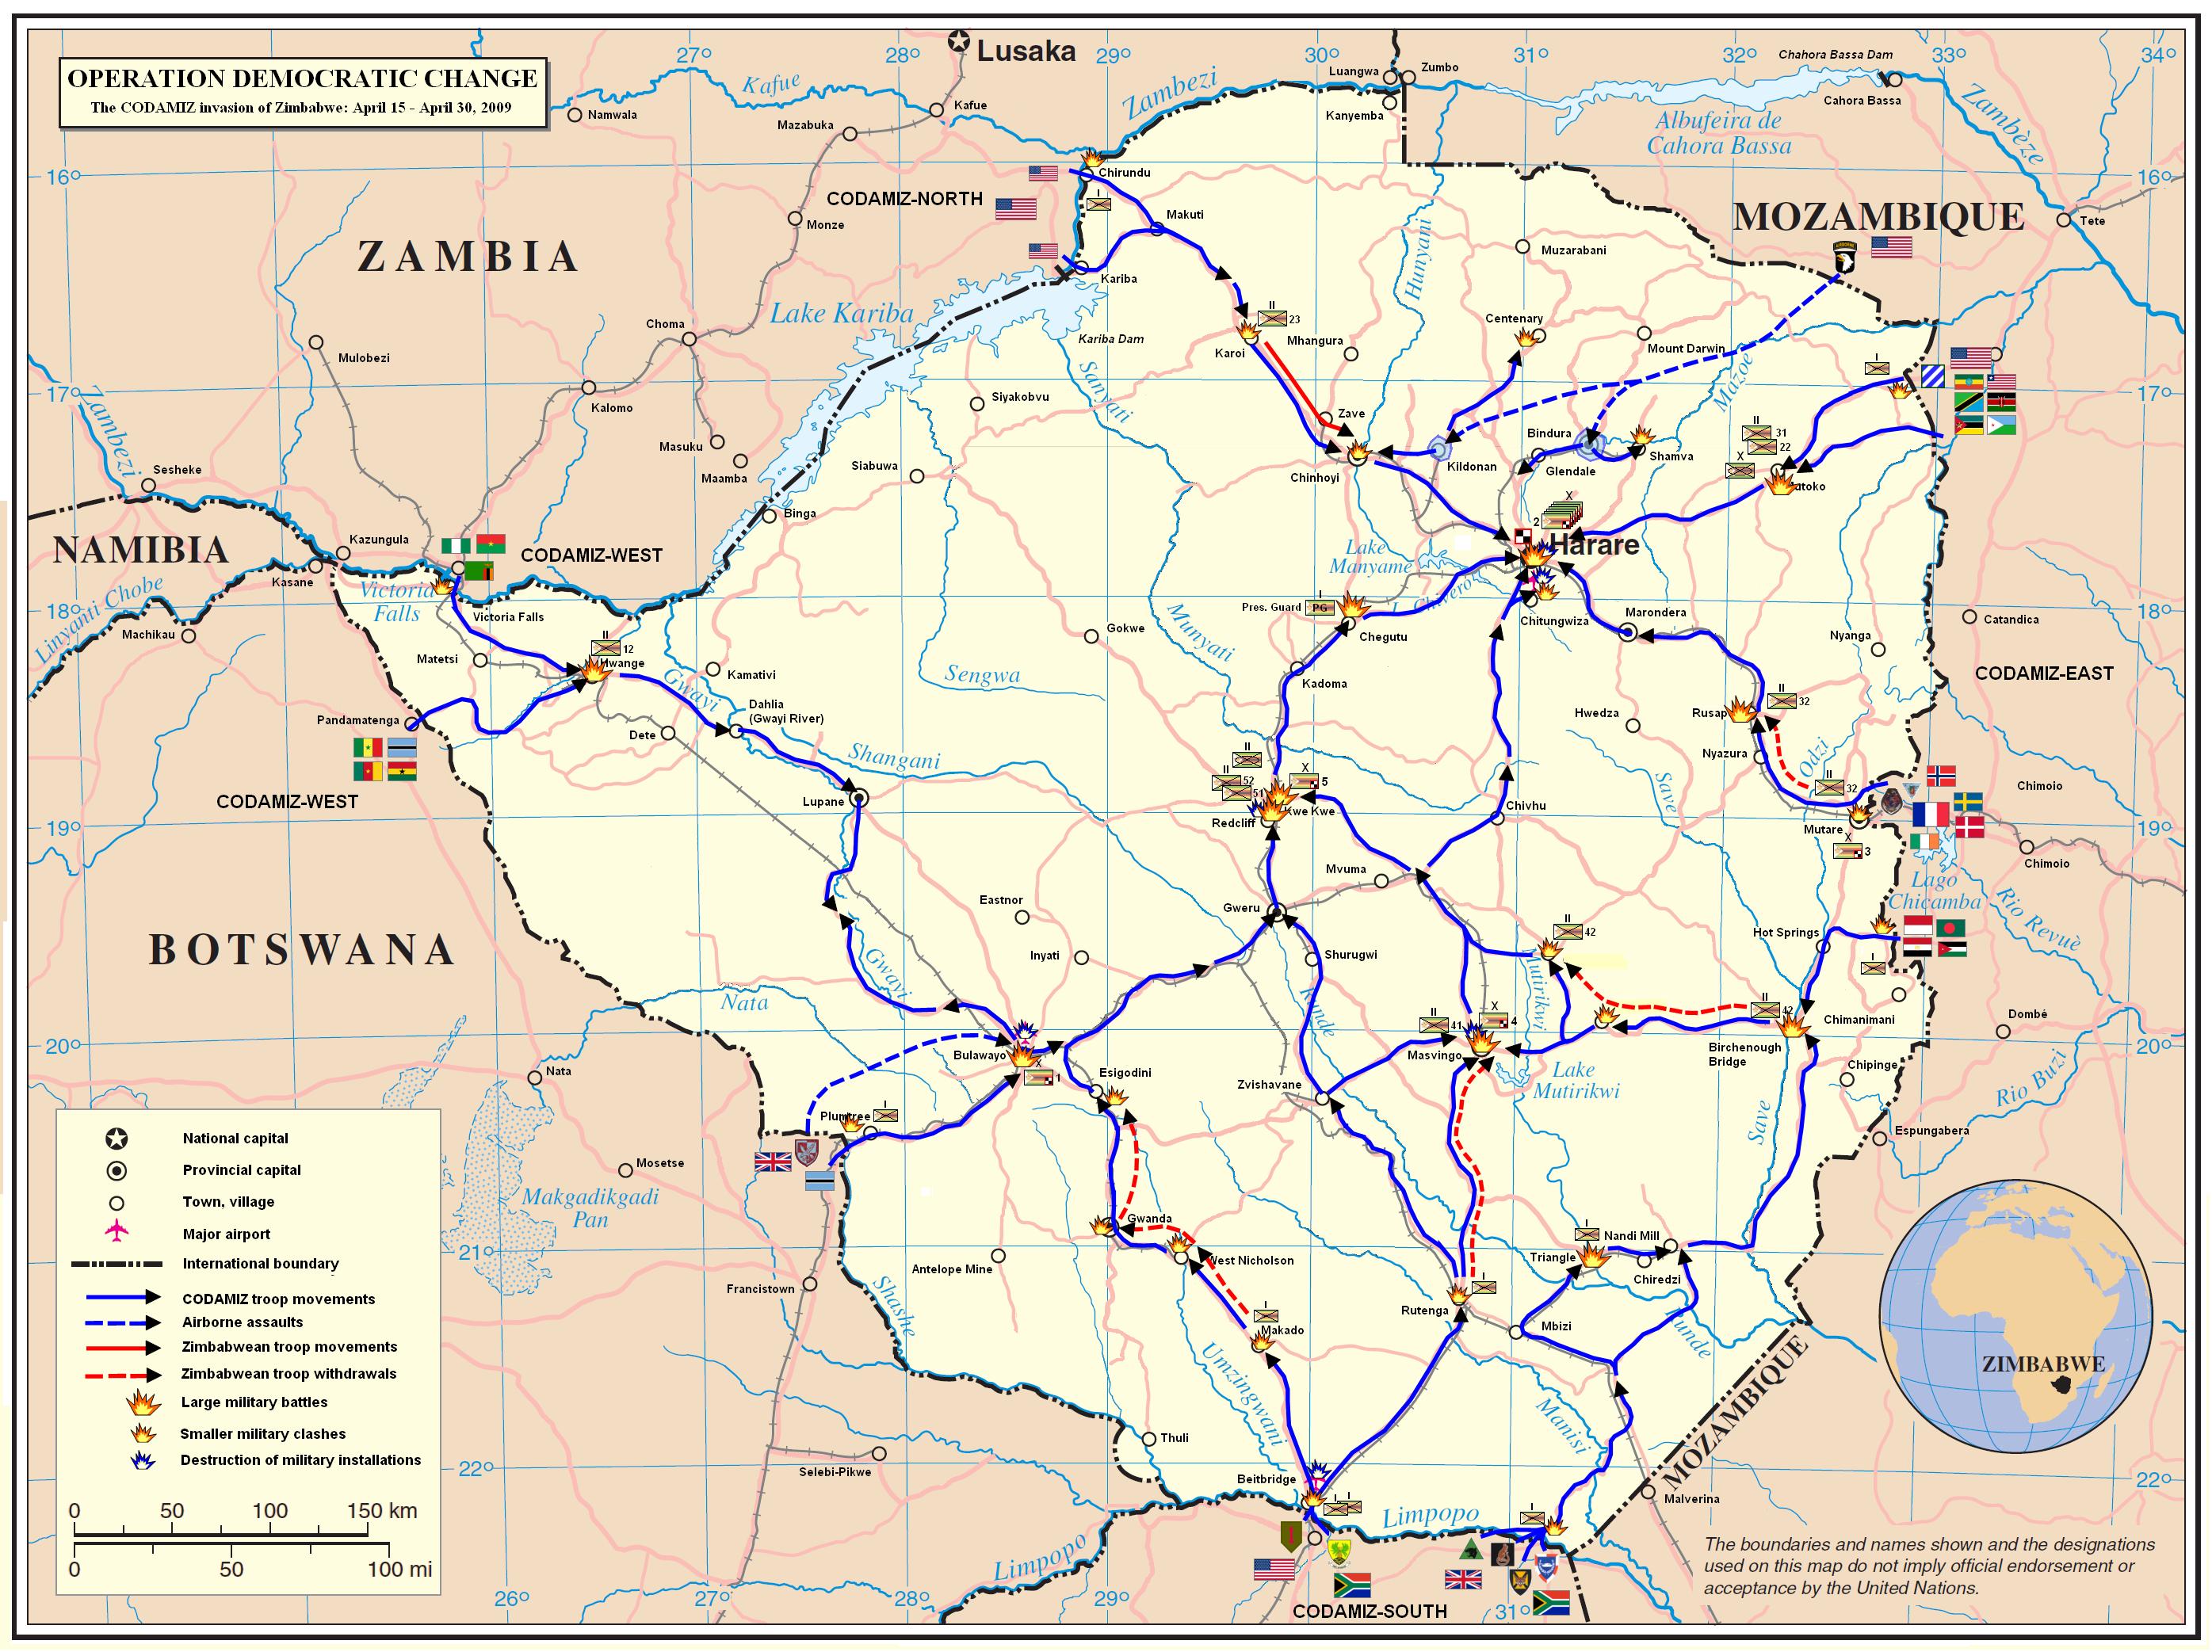 Zimbabwe Highway Map on zimbabwe tourist attractions, zimbabwe history, africa road map, nevis road map, australia road map, crimea road map, india road map, palau road map, french guiana road map, zimbabwe market, caicos islands road map, dakar road map, harare road map, paraguay road map, montserrat road map, saba road map, zimbabwe resources, uk england road map, st barts road map, u.s. road map,